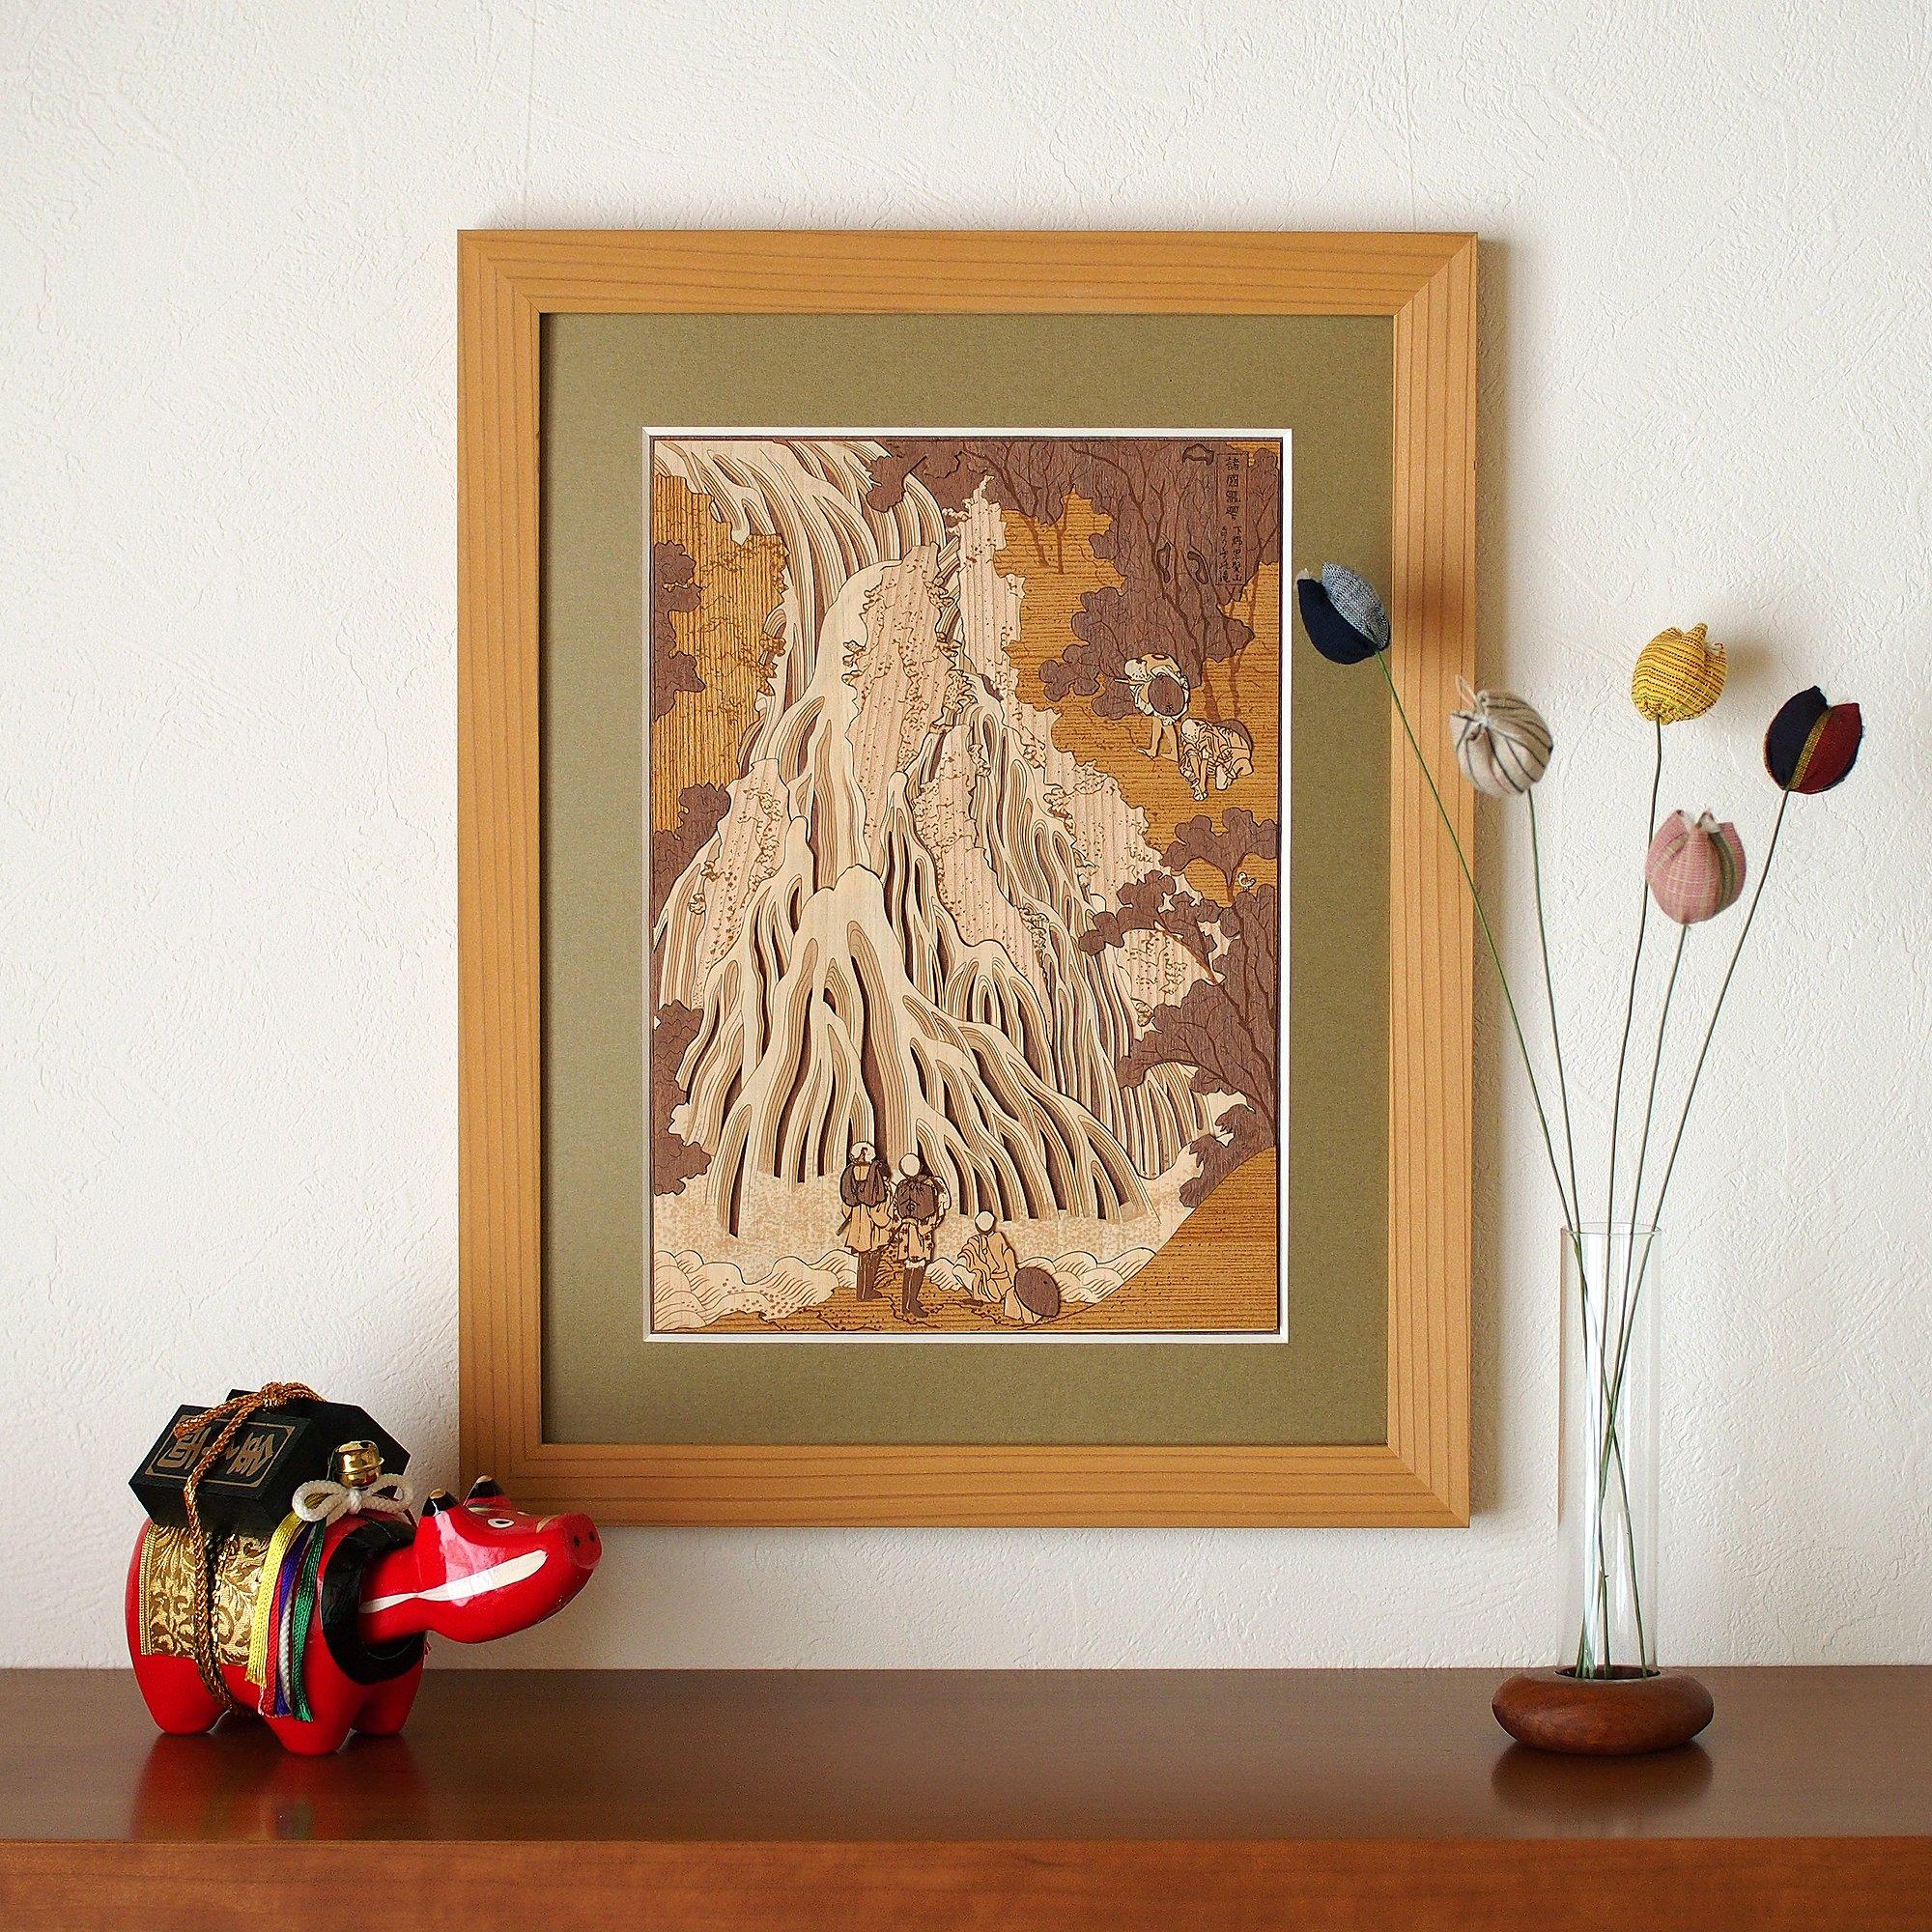 KINOWA Ukiyoe Art Kit Kiharie Kirifuri Waterfall at Mt. Kurokami in Shimotsuke Made in Japan by KINOWA (Image #6)